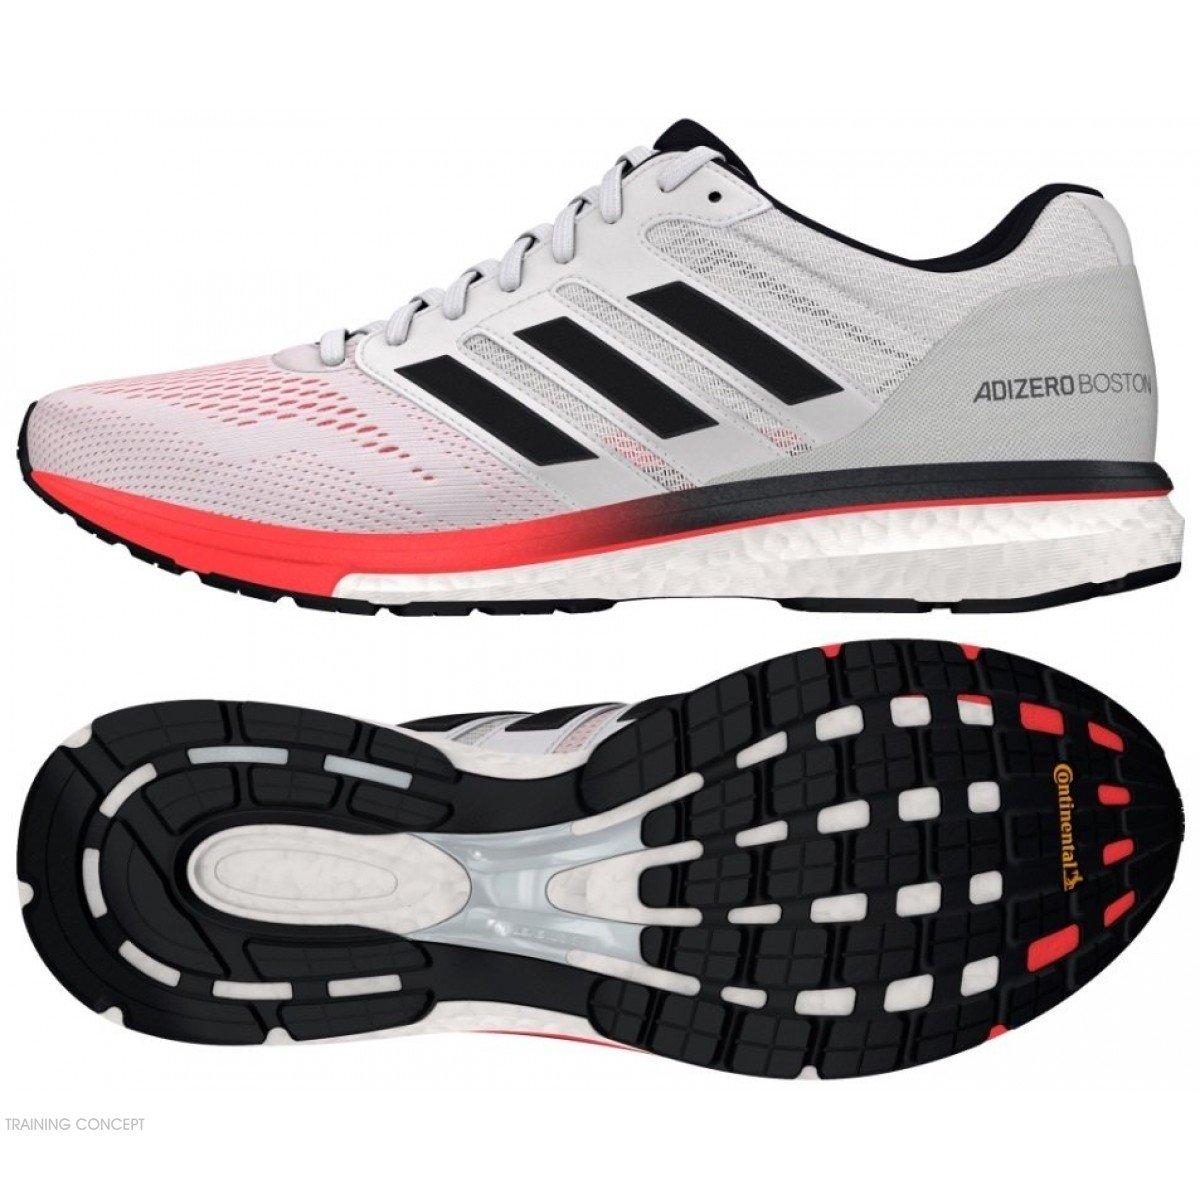 new concept 98b7c 80092 chaussures de running pour hommes adidas adizero boston 7 b37381 white   carbon  shock red